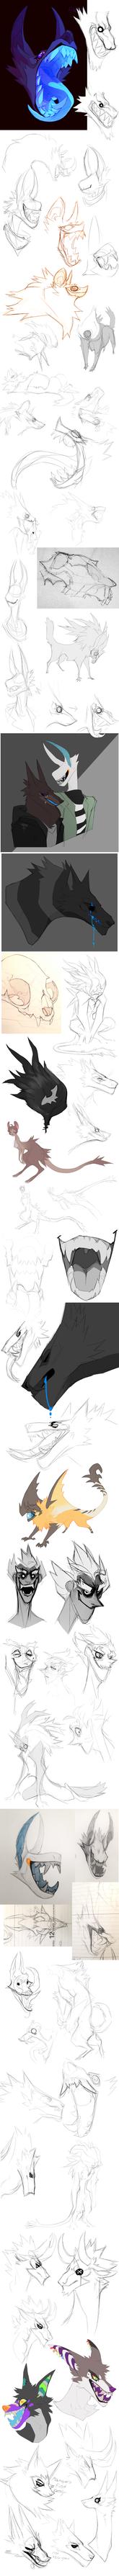 Sketch Dump no.21 by Dusty-Demon